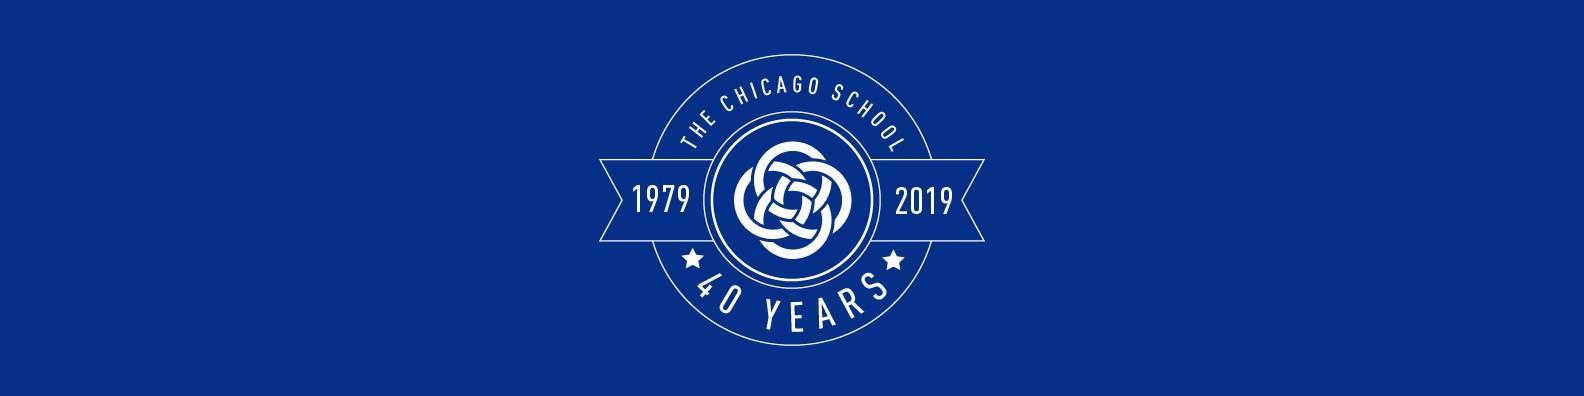 Massachusetts School Of Professional Psychology >> The Chicago School Of Professional Psychology Linkedin